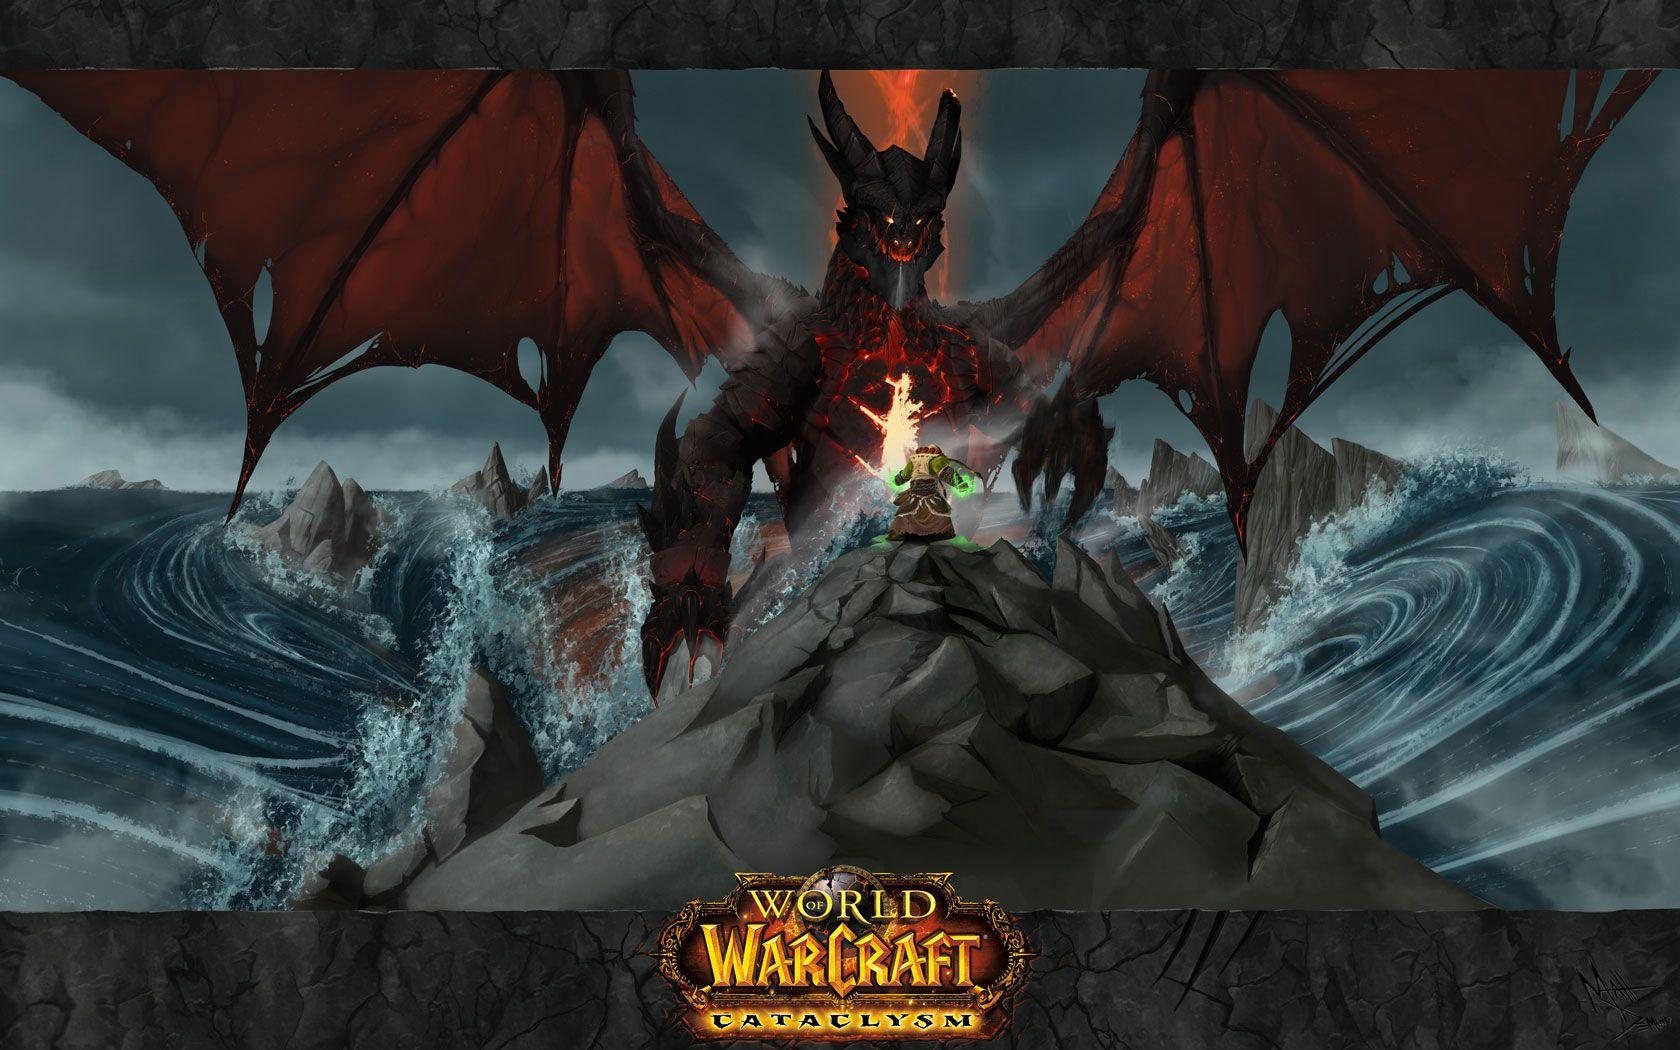 World Of Warcraft Cataclysm Wallpaper Minimalism World